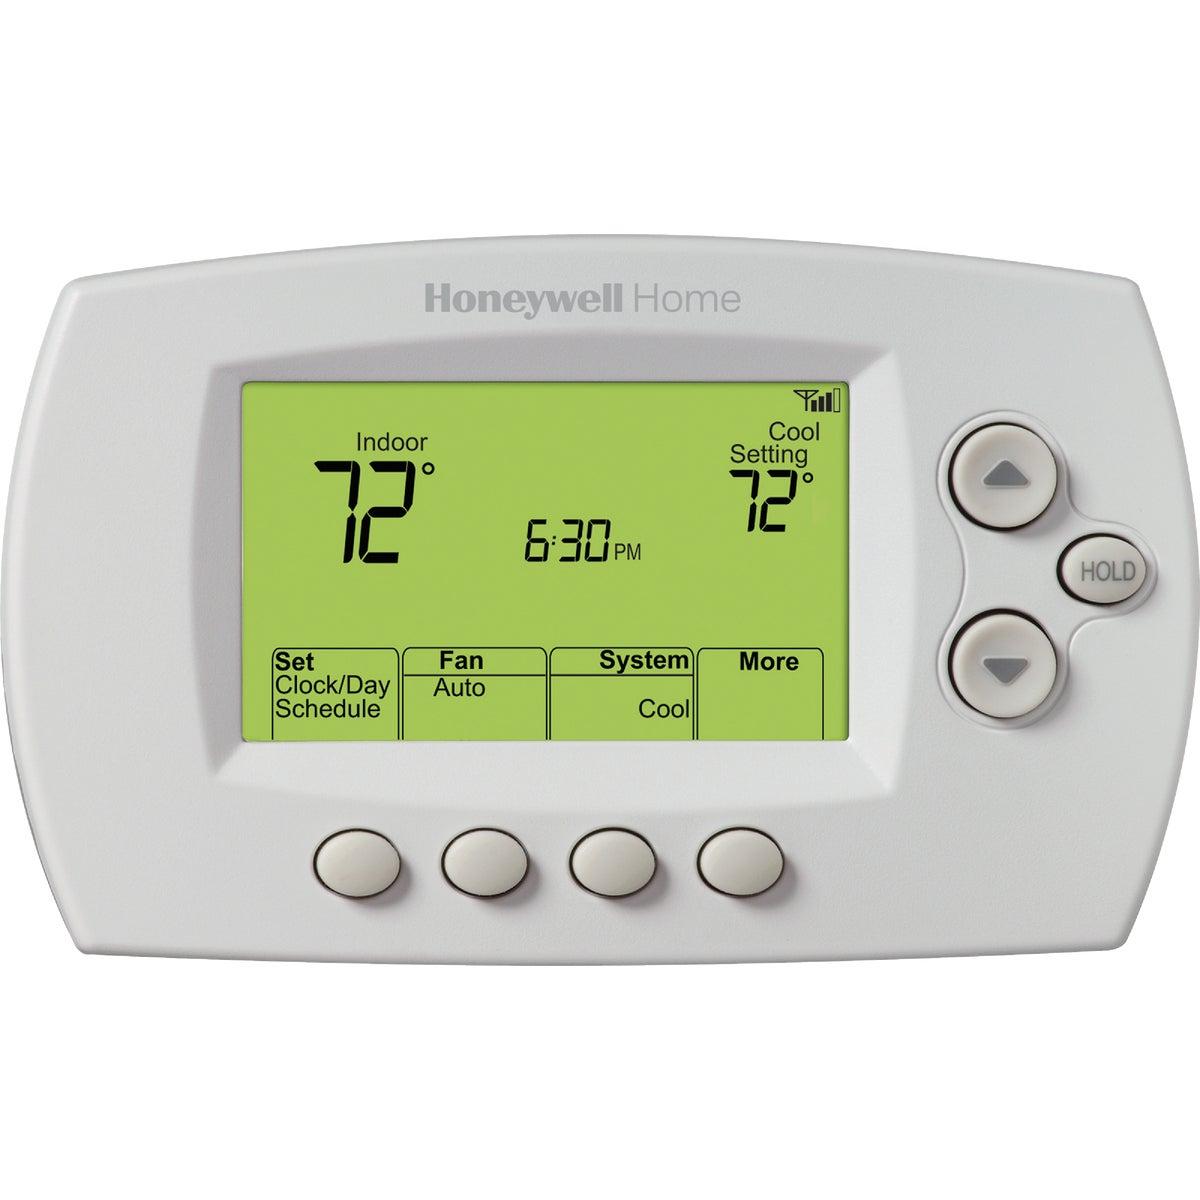 7 DAY WIFI THERMOSTAT - RTH6580WF by Honeywell Internatl